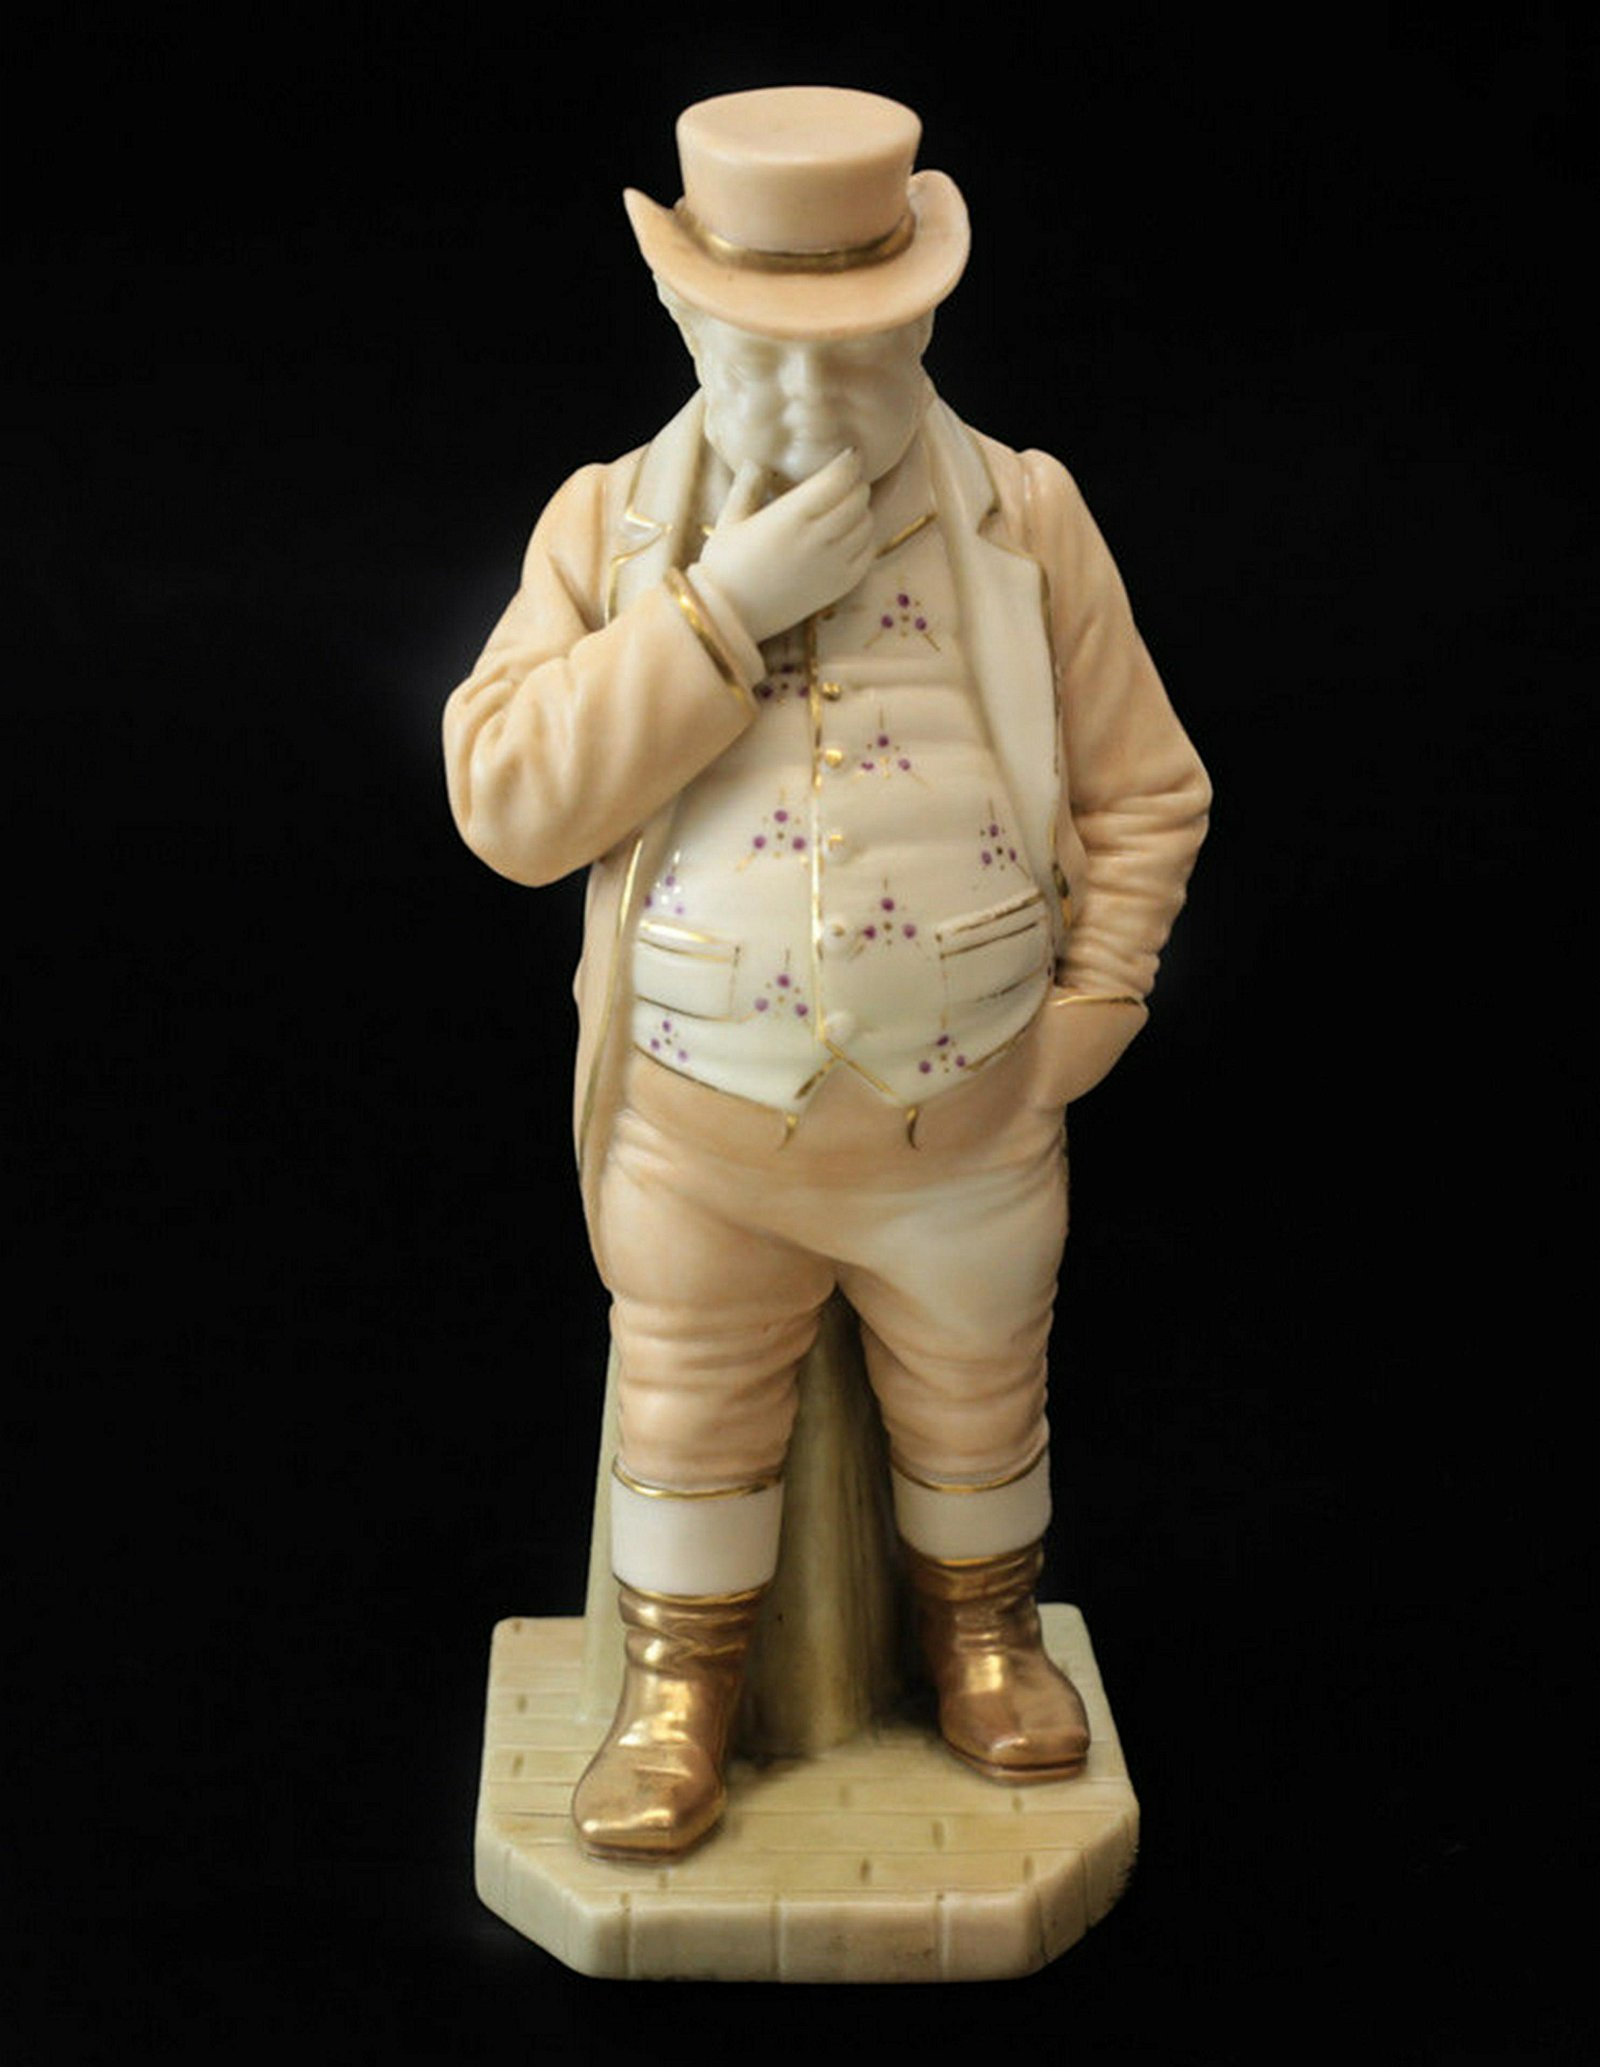 Royal Worcester Blush Porcelain John Bull Figurine